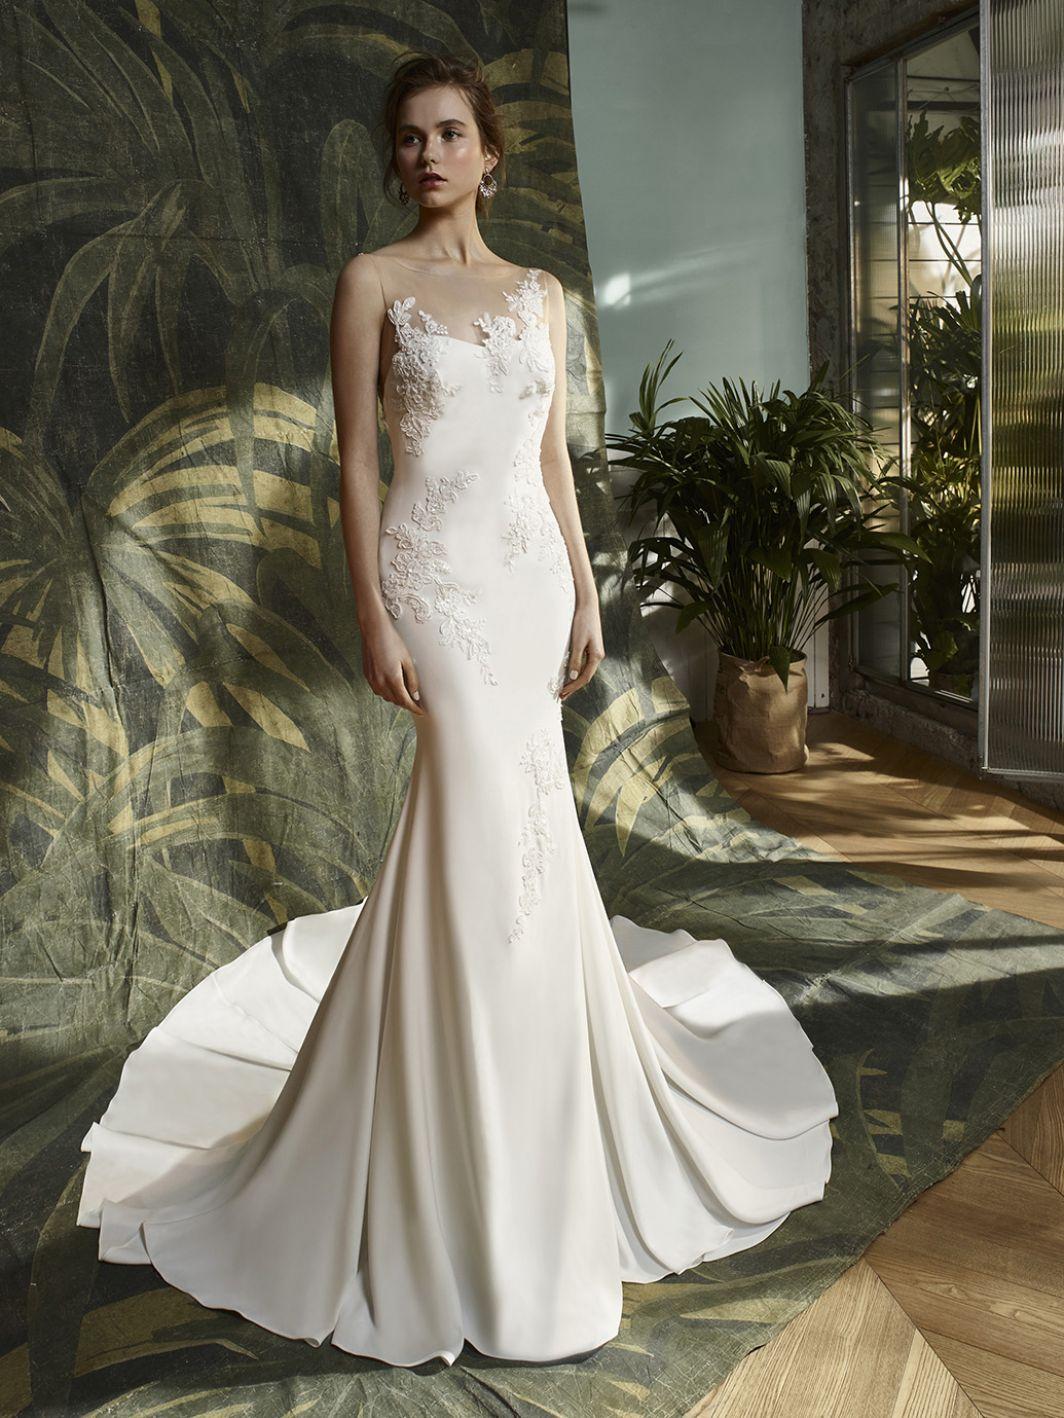 L A Bridal House Designer Sample Sale - LA Bridal House